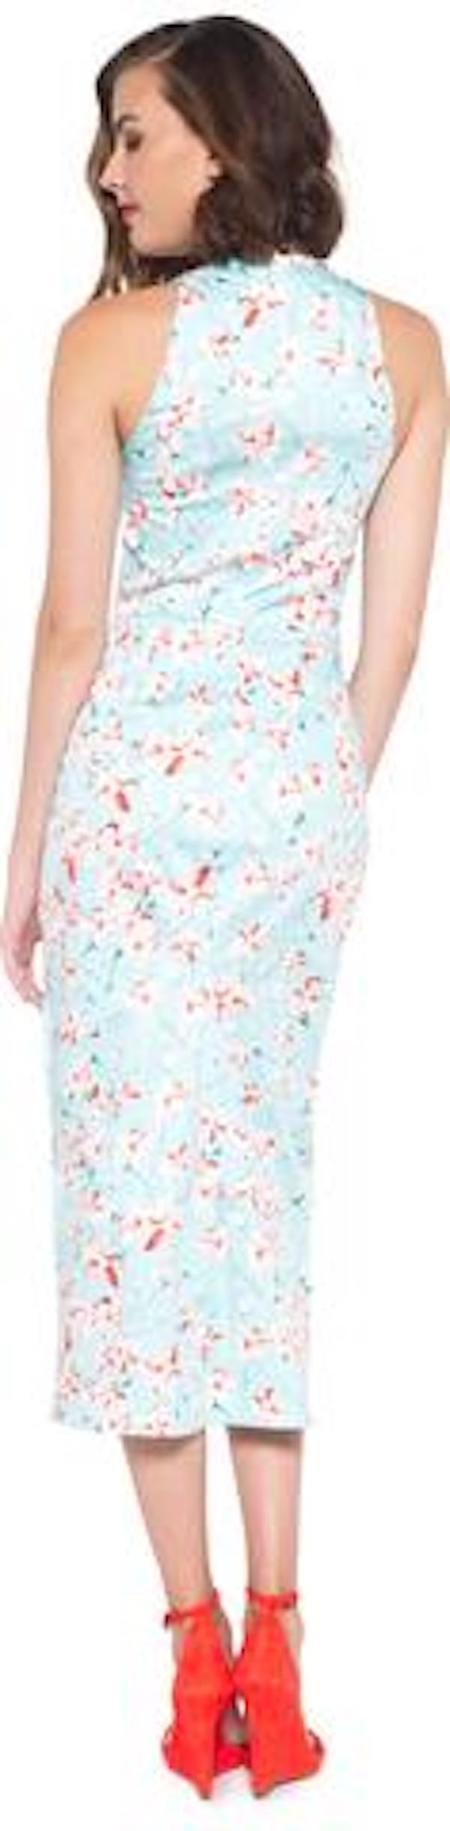 3rd Floor Studio Kendra Blossom Dress